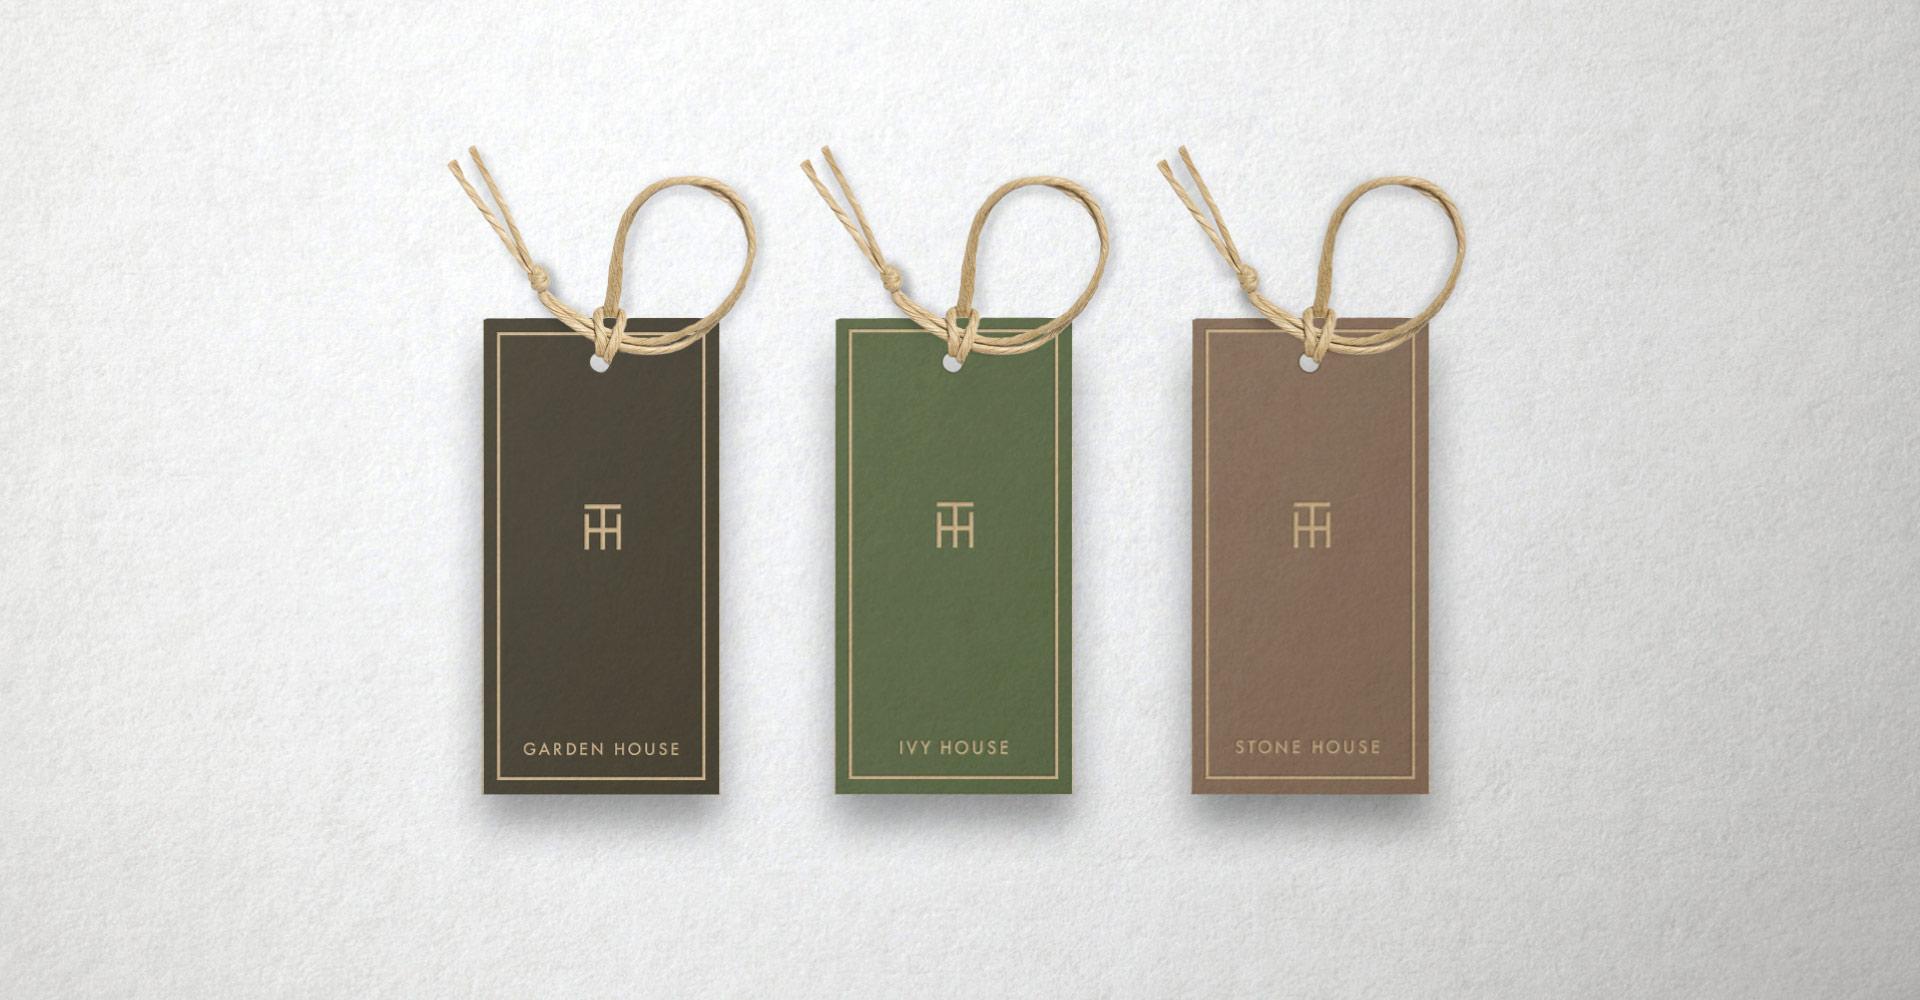 Creative_Retail_Packaging_Thompson_Hanson_Branding_12.jpg